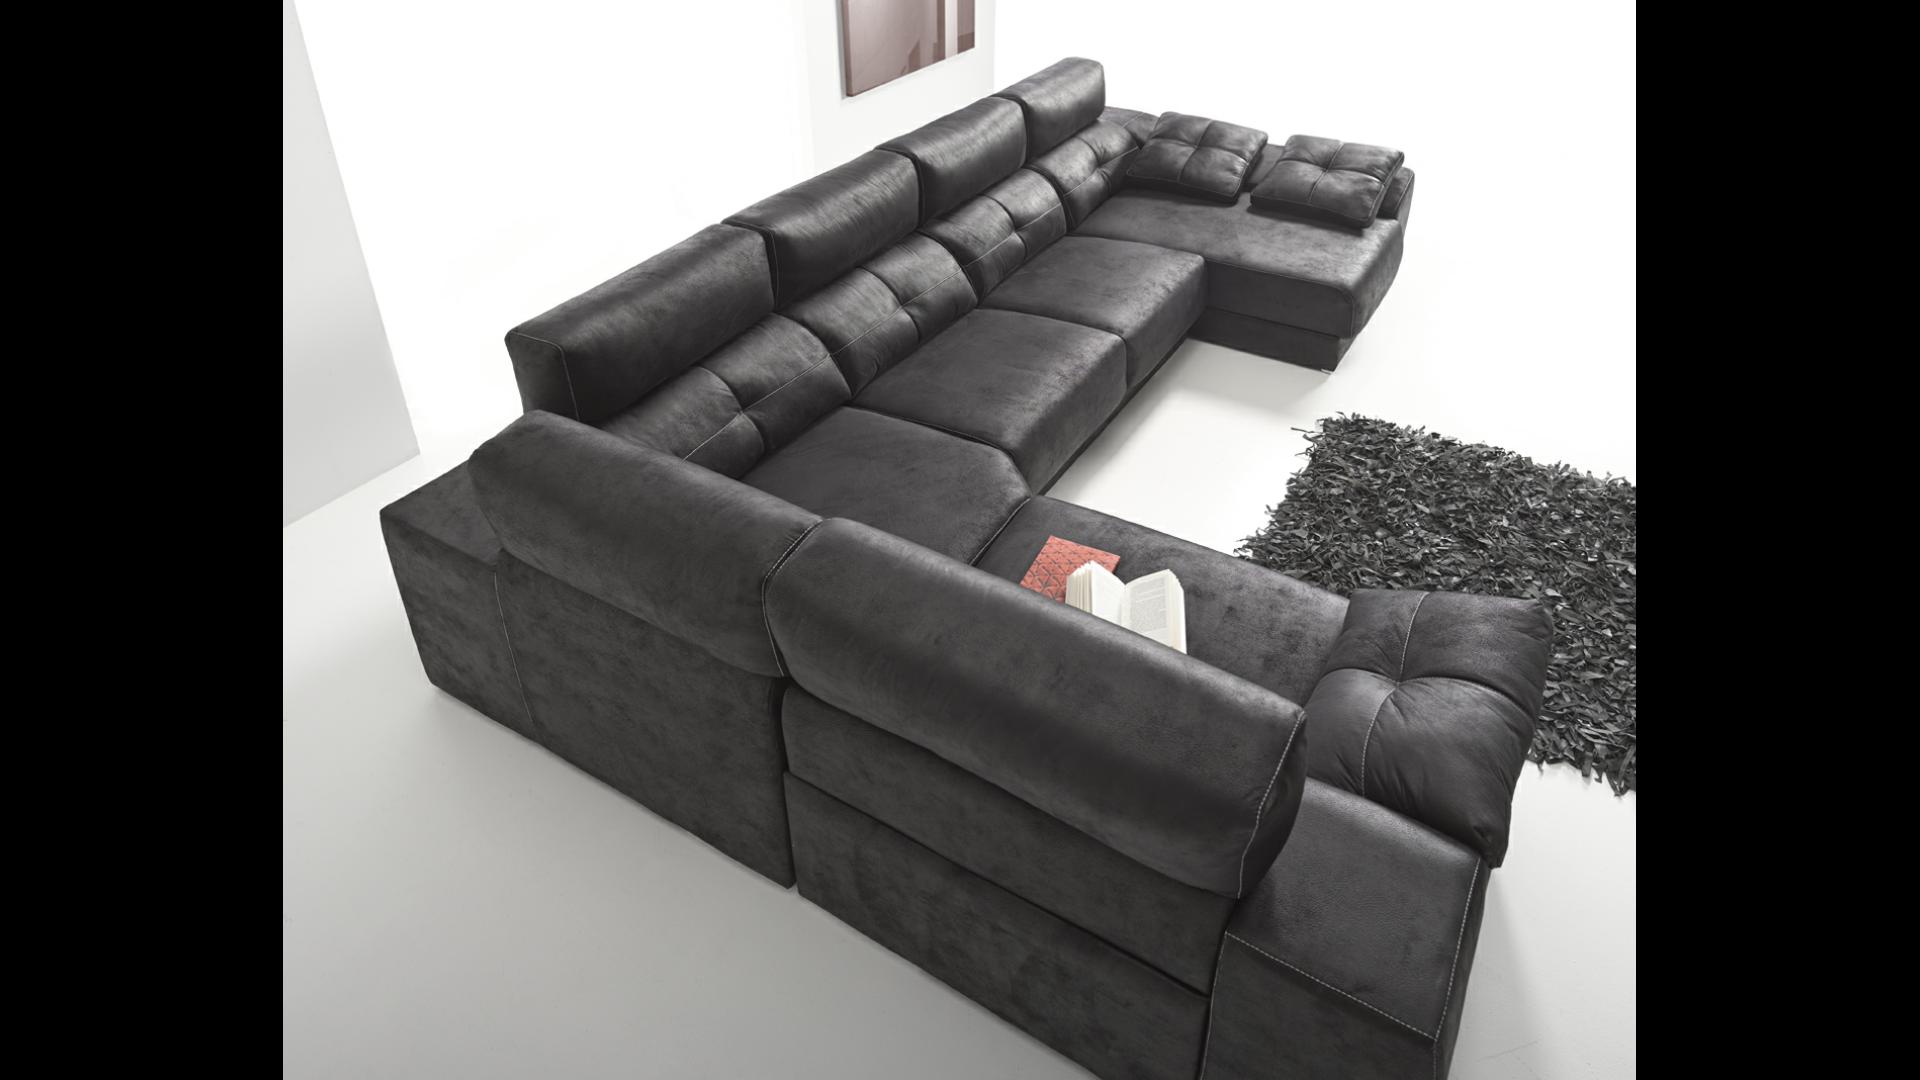 CHAISELONGUE RINCONERA MEMORY - Confortable on chaise recliner chair, chaise sofa sleeper, chaise furniture,